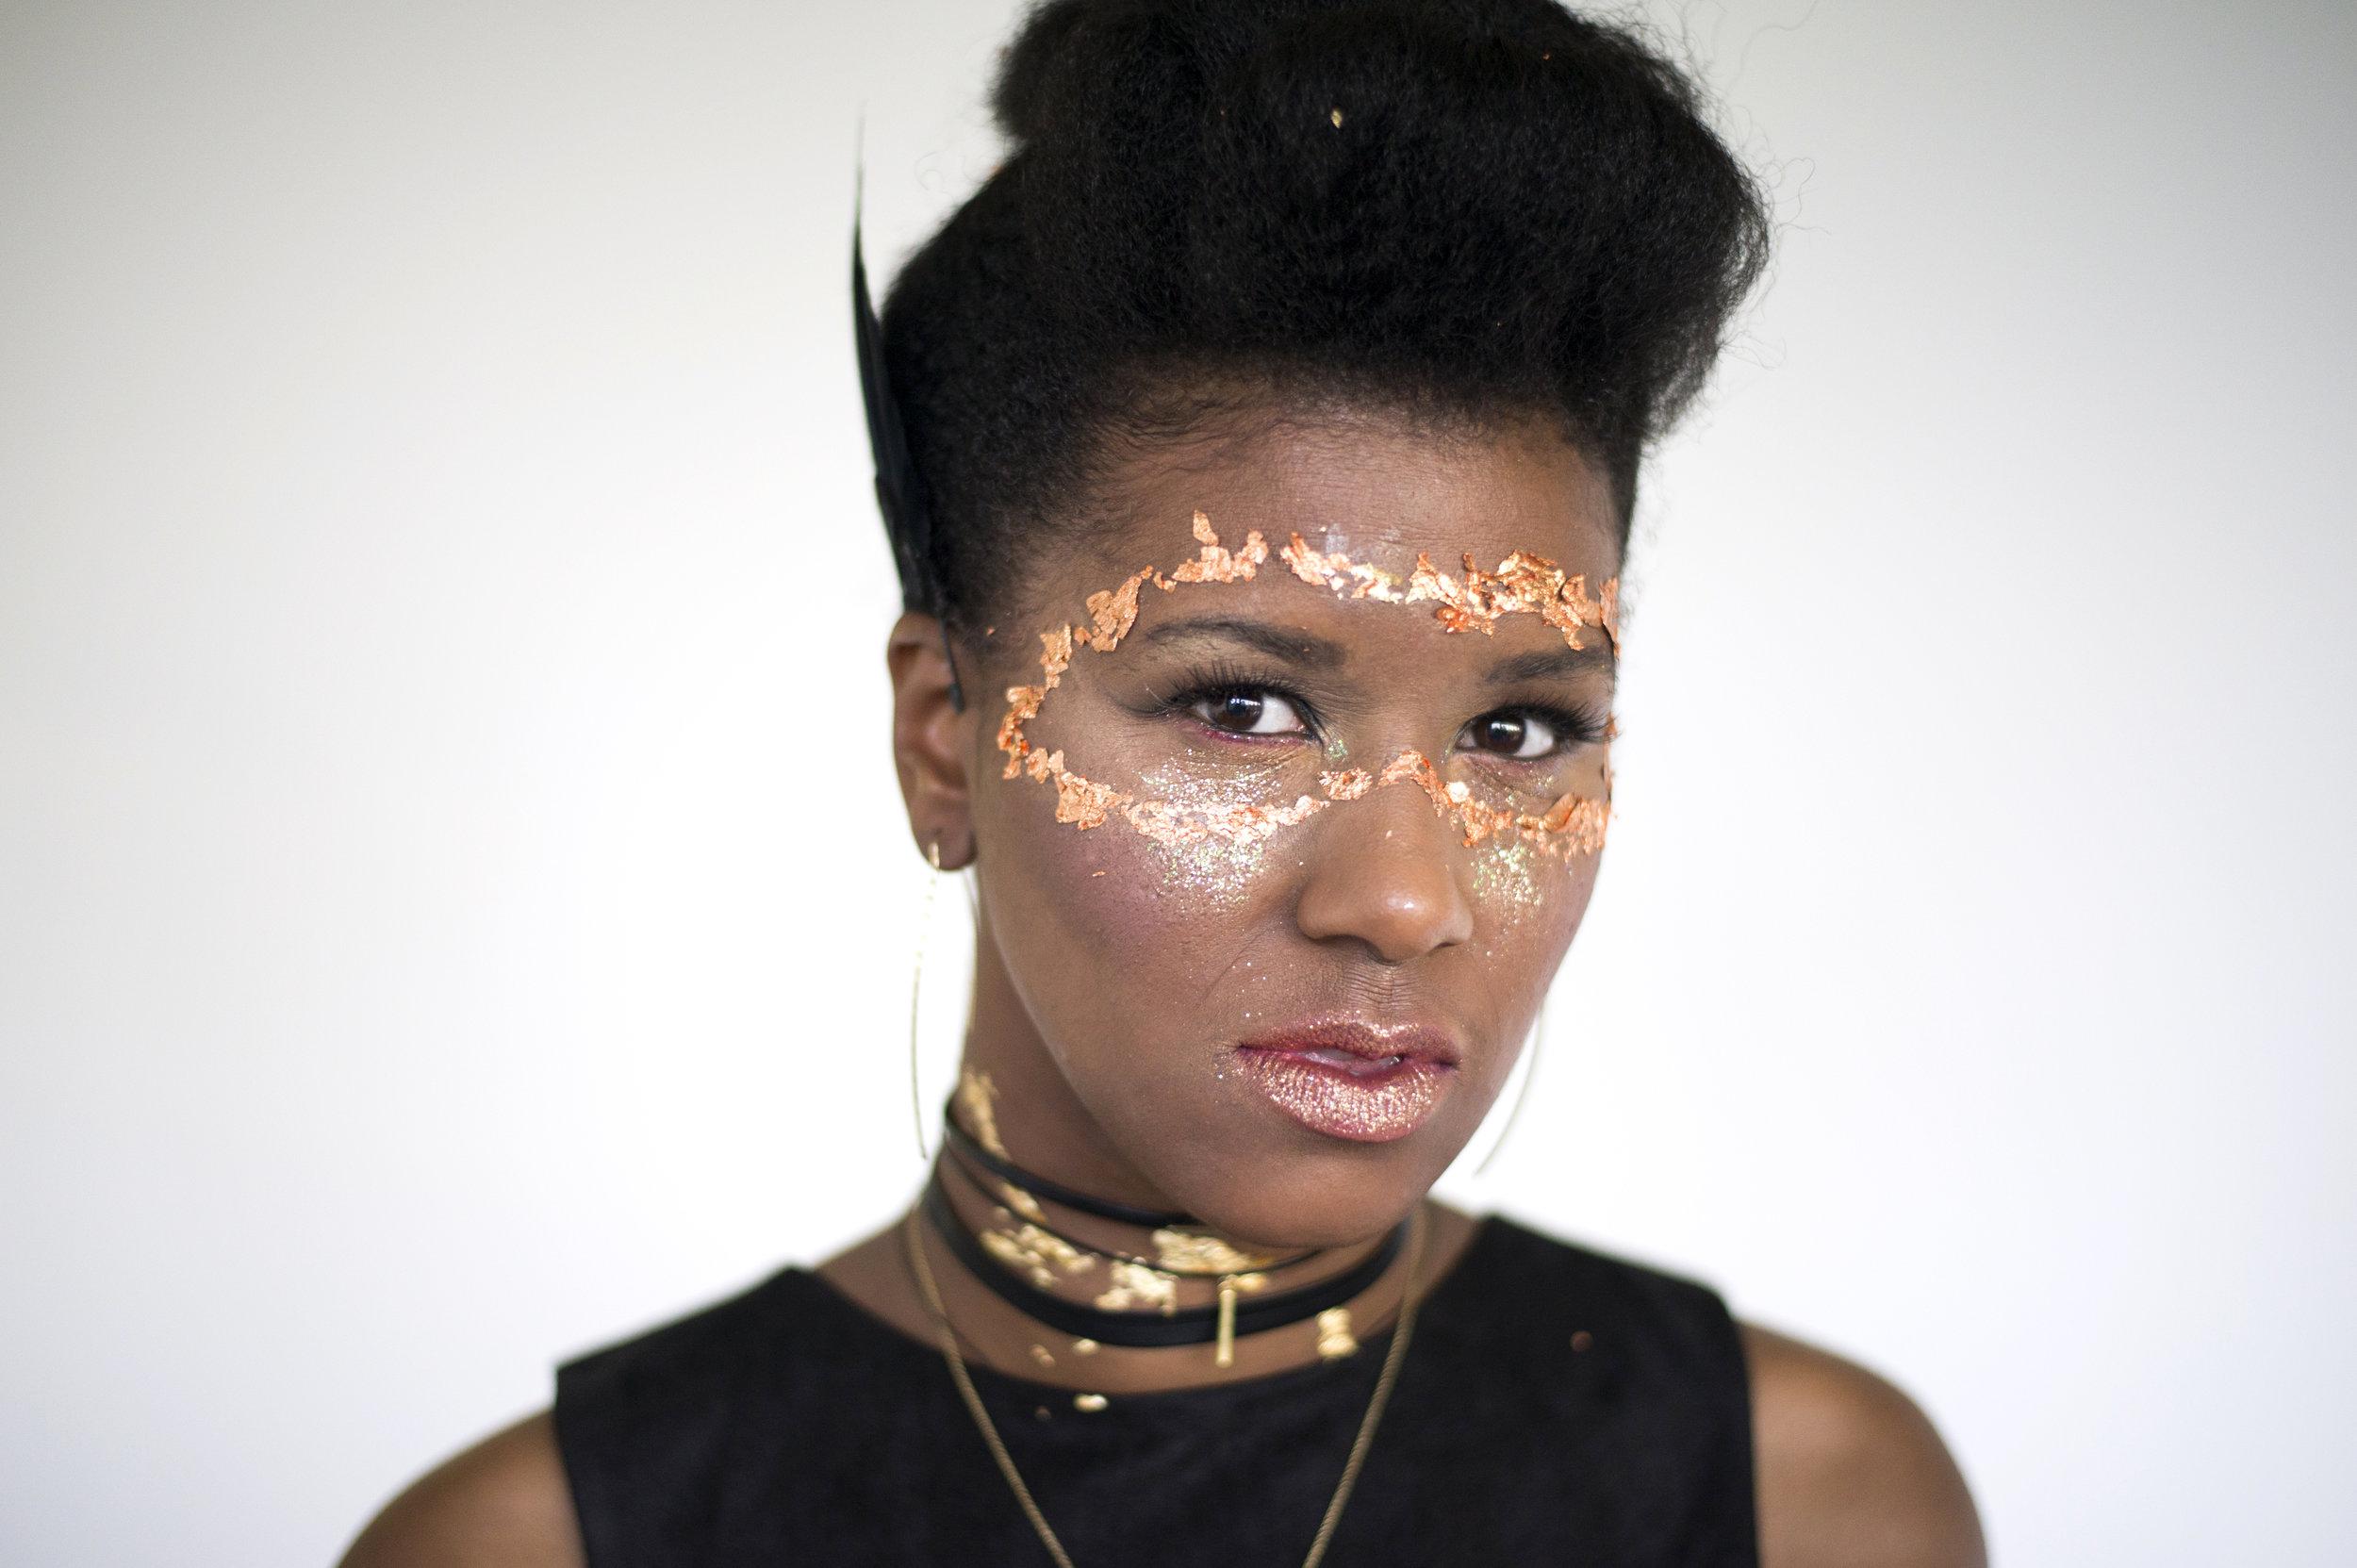 Makeup+Black Clothes_Allie Appel_98.jpg